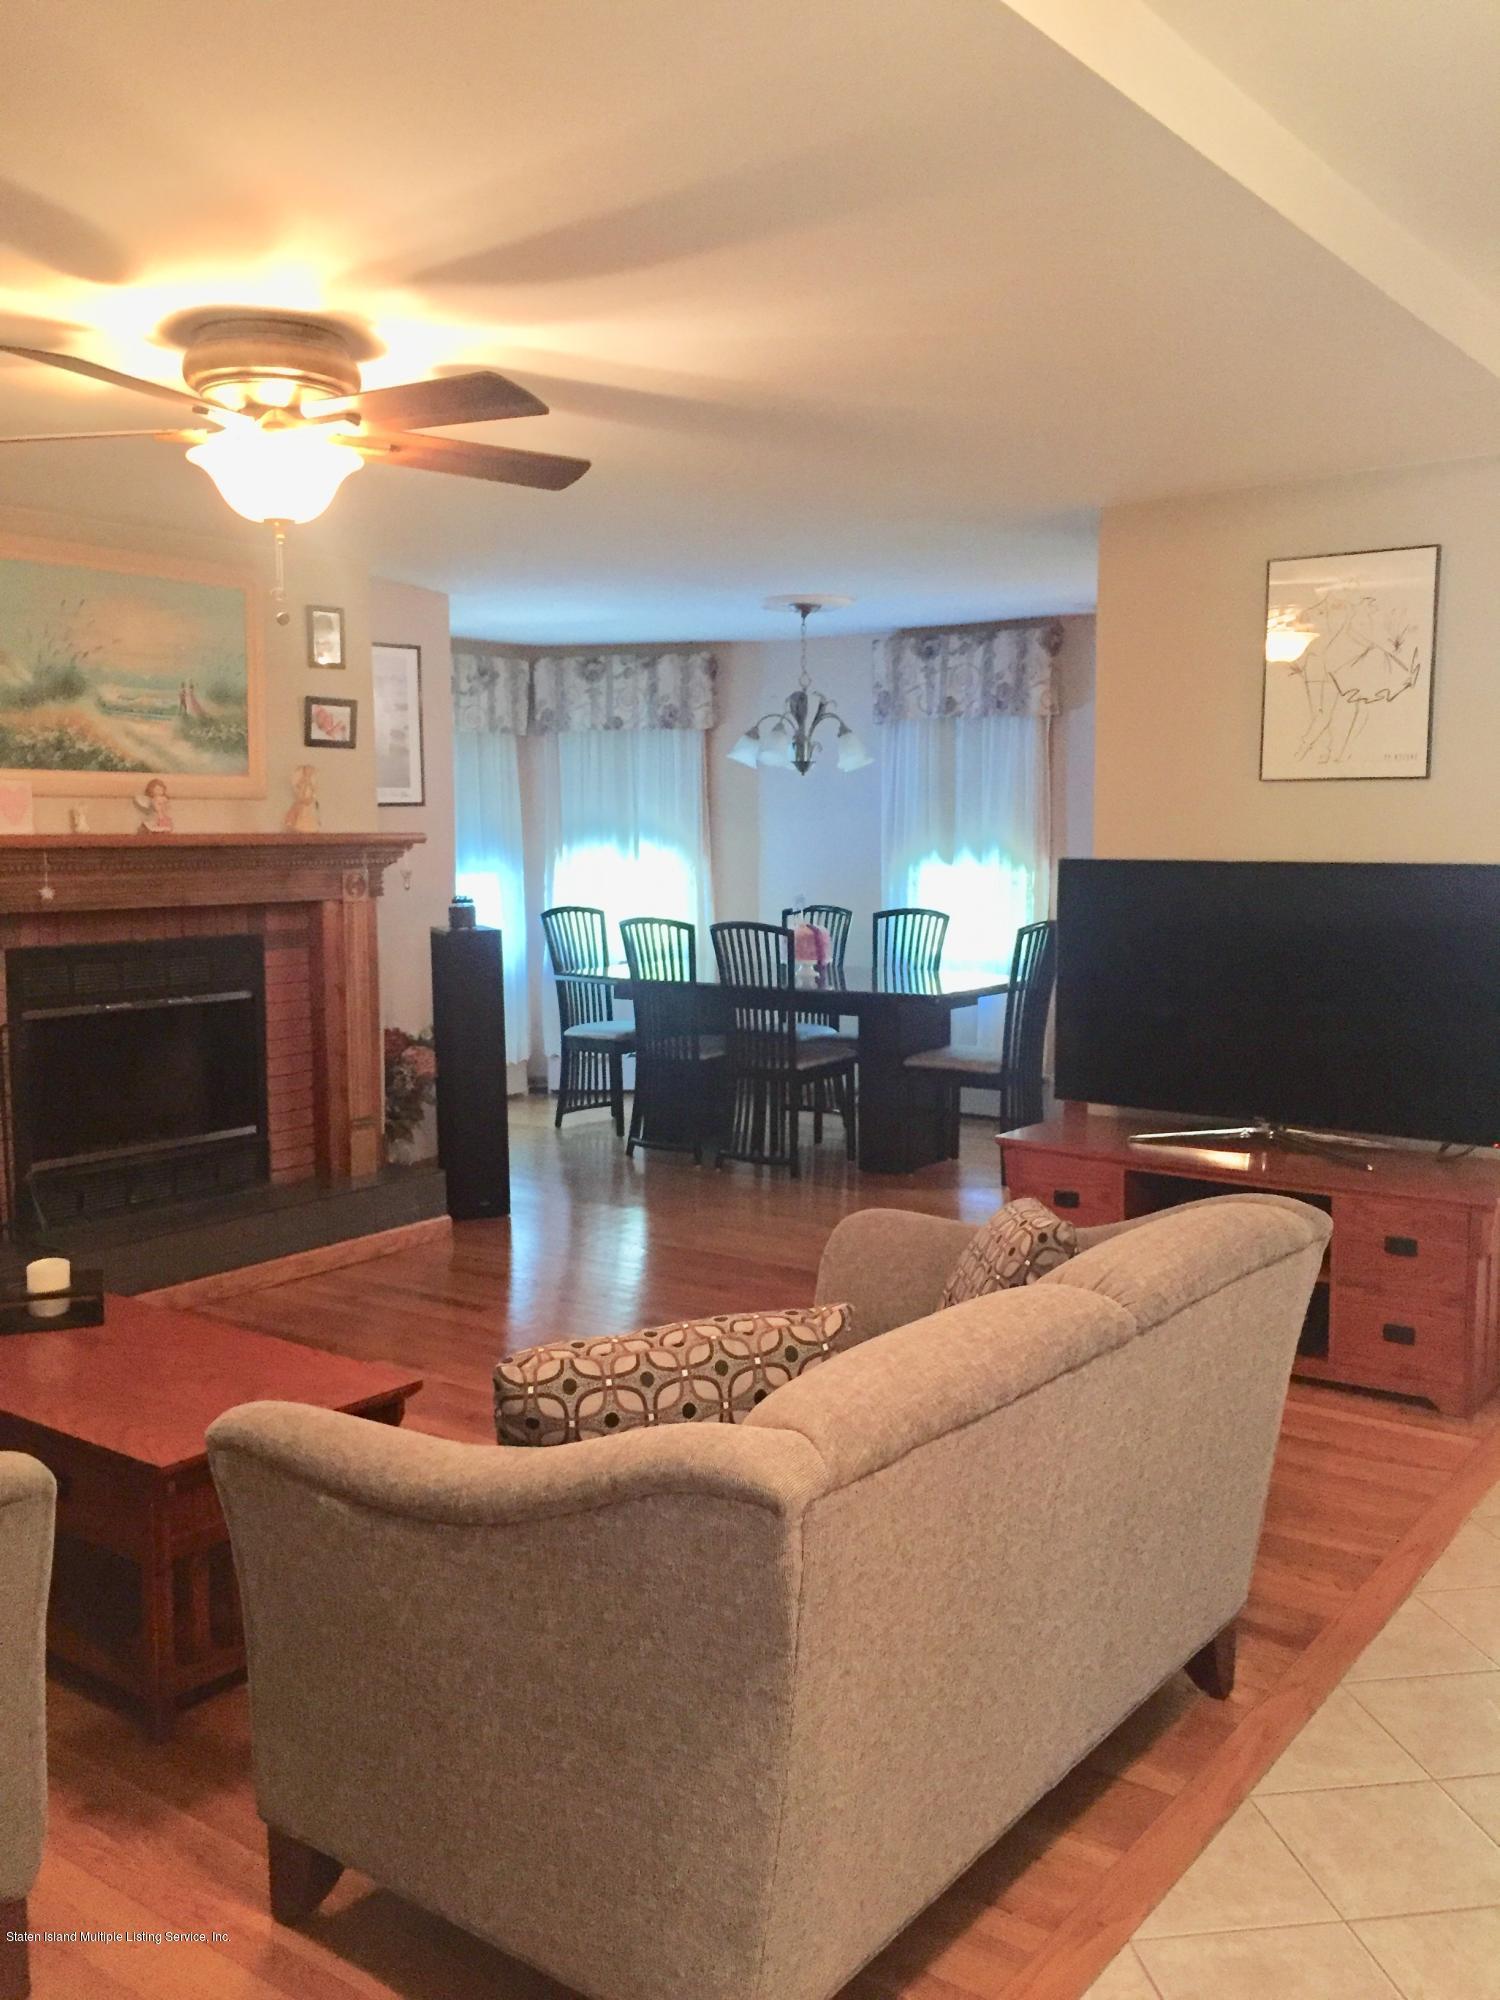 Single Family - Detached 113 Woodvale Avenue  Staten Island, NY 10309, MLS-1127531-5